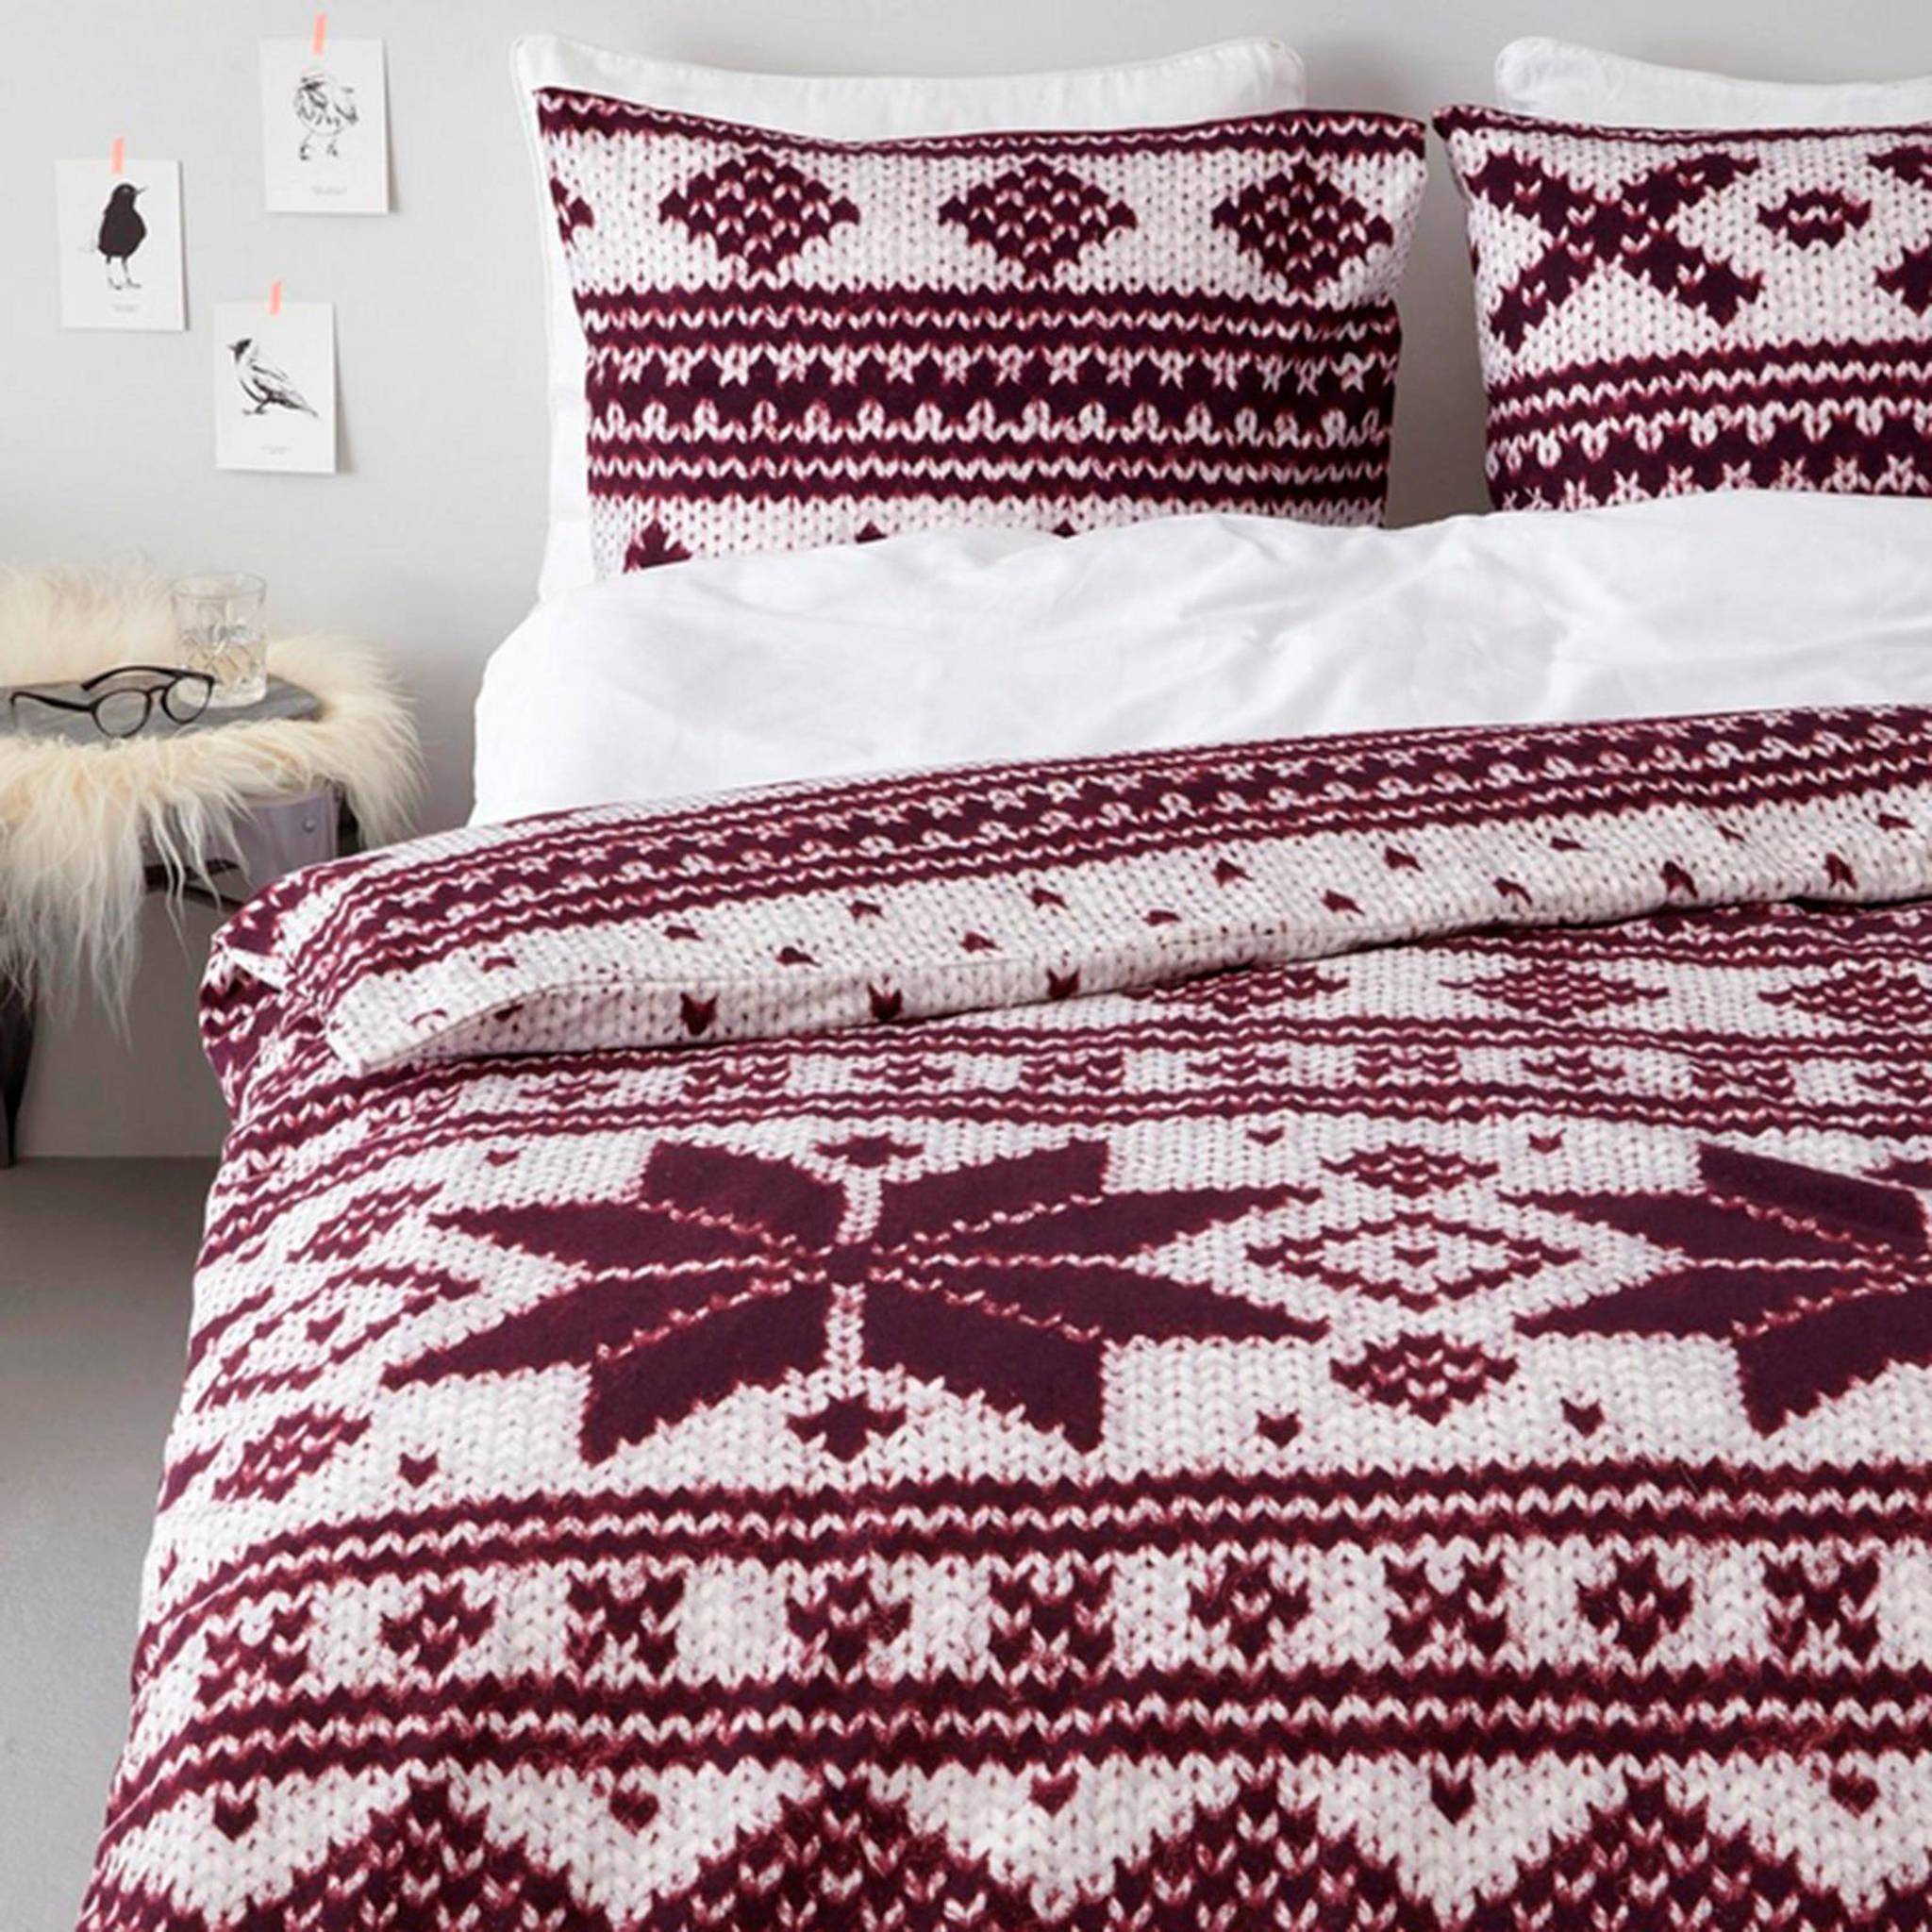 beddinghouse flanellen dekbedovertrek lits jumeaux rood